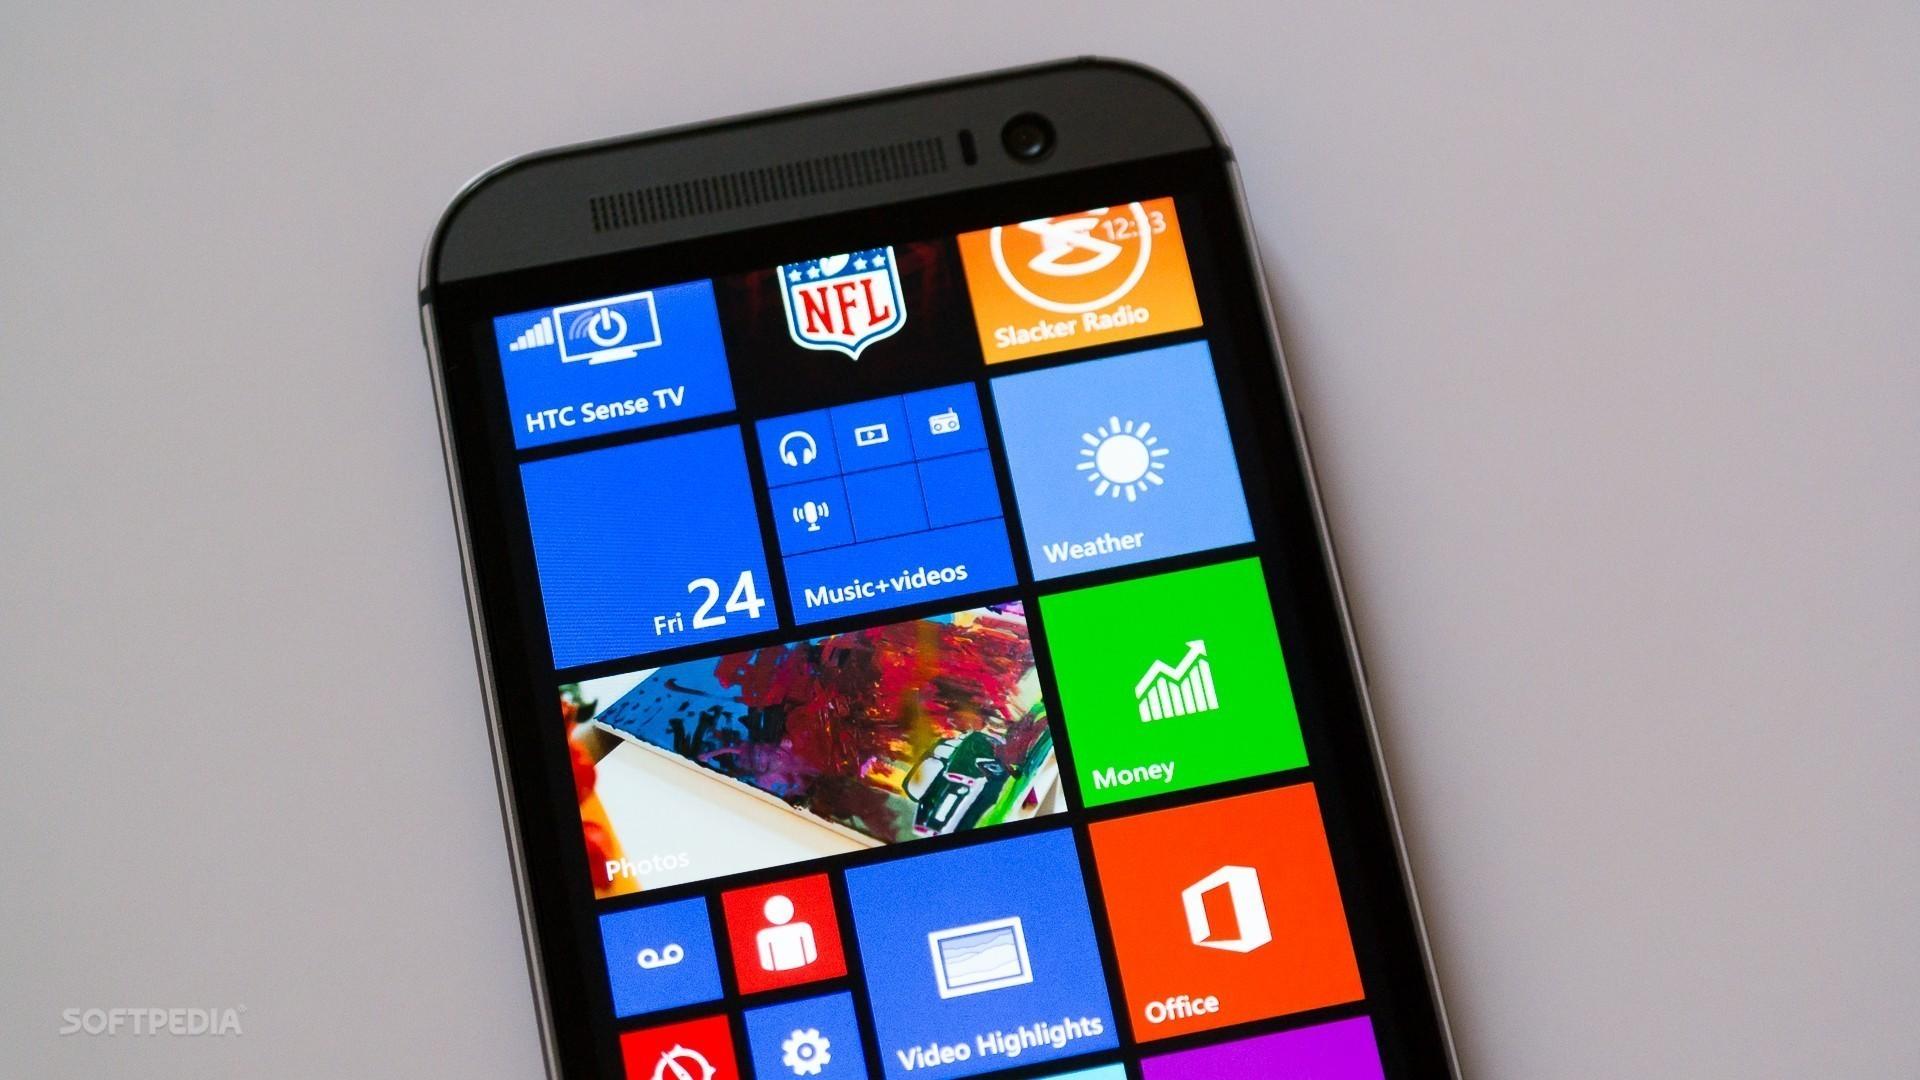 HTC Hima Ace Plus Specs: 5 5-Inch QHD Display, Snapdragon 810